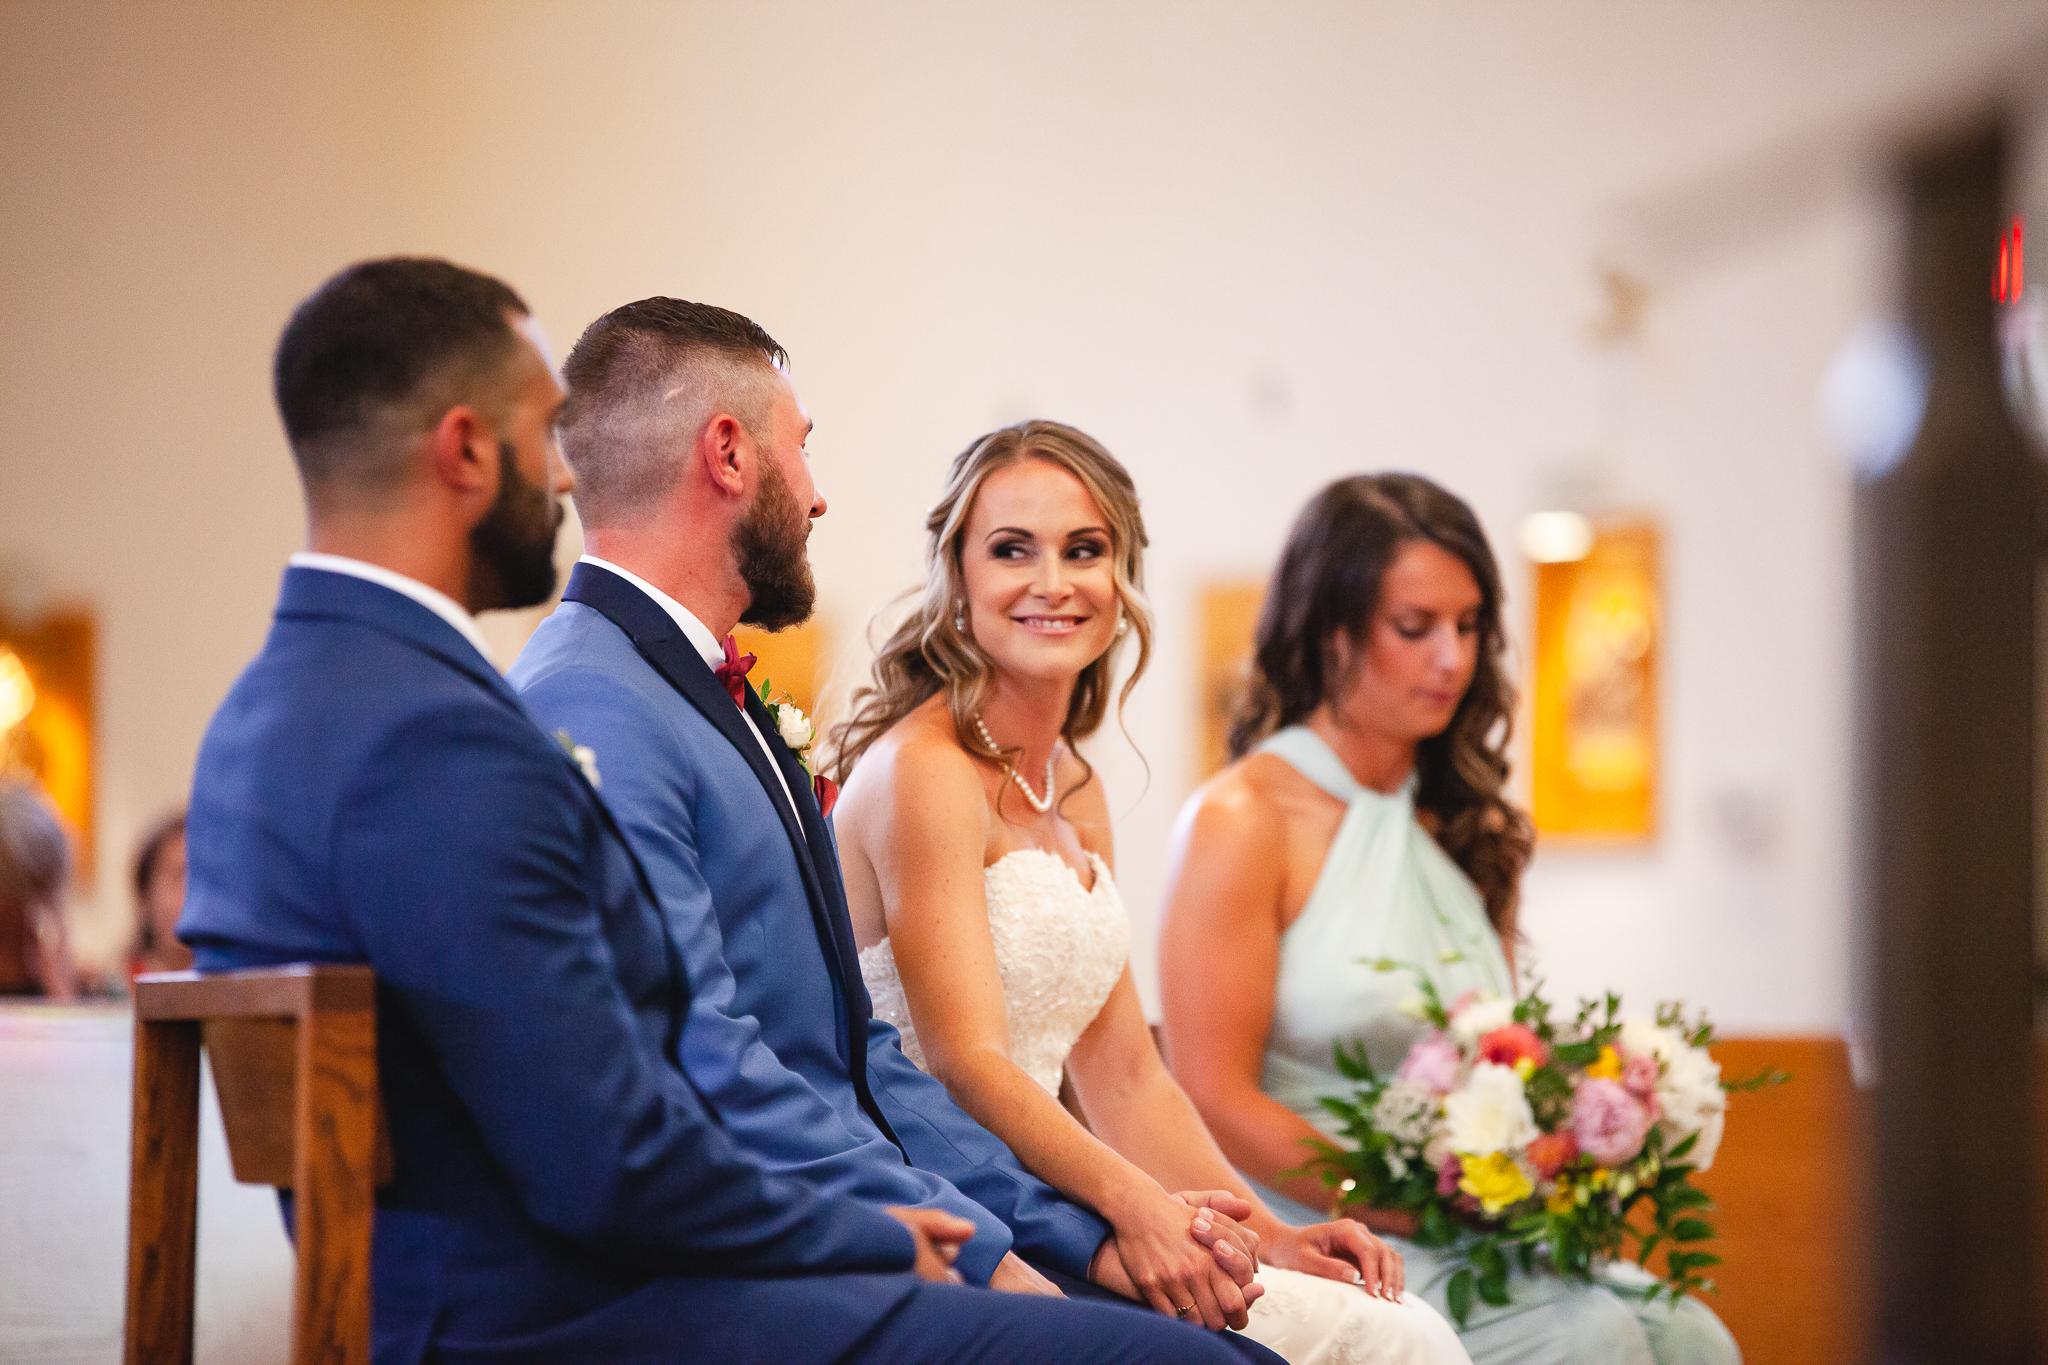 Amy D Photography- Wedding Ceremony- Muskoka Wedding Photography- Barrie Wedding Photography- Best Wedding Photographers 2018- Bride and Groom-8.jpg